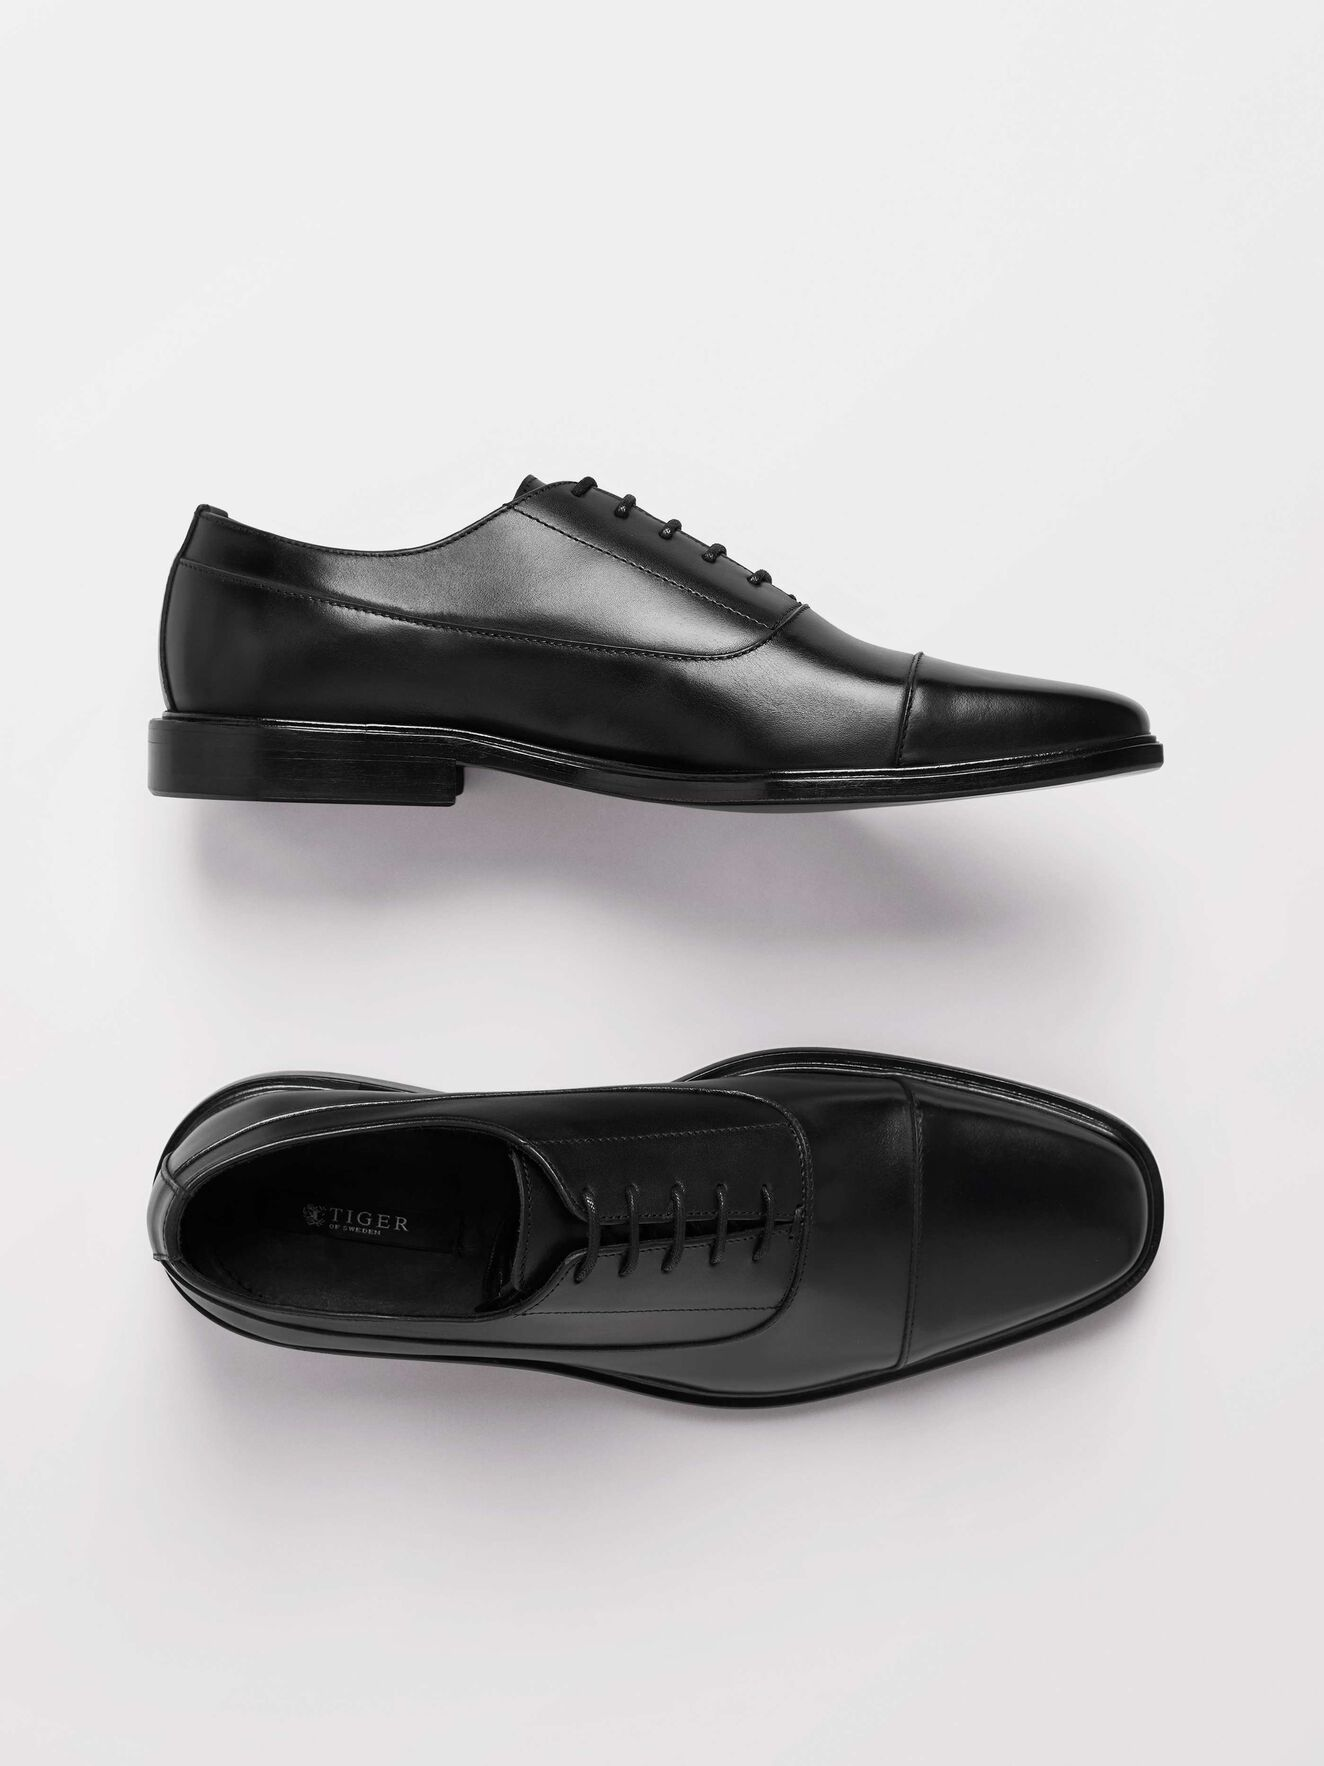 Sinter Shoe in Black from Tiger of Sweden